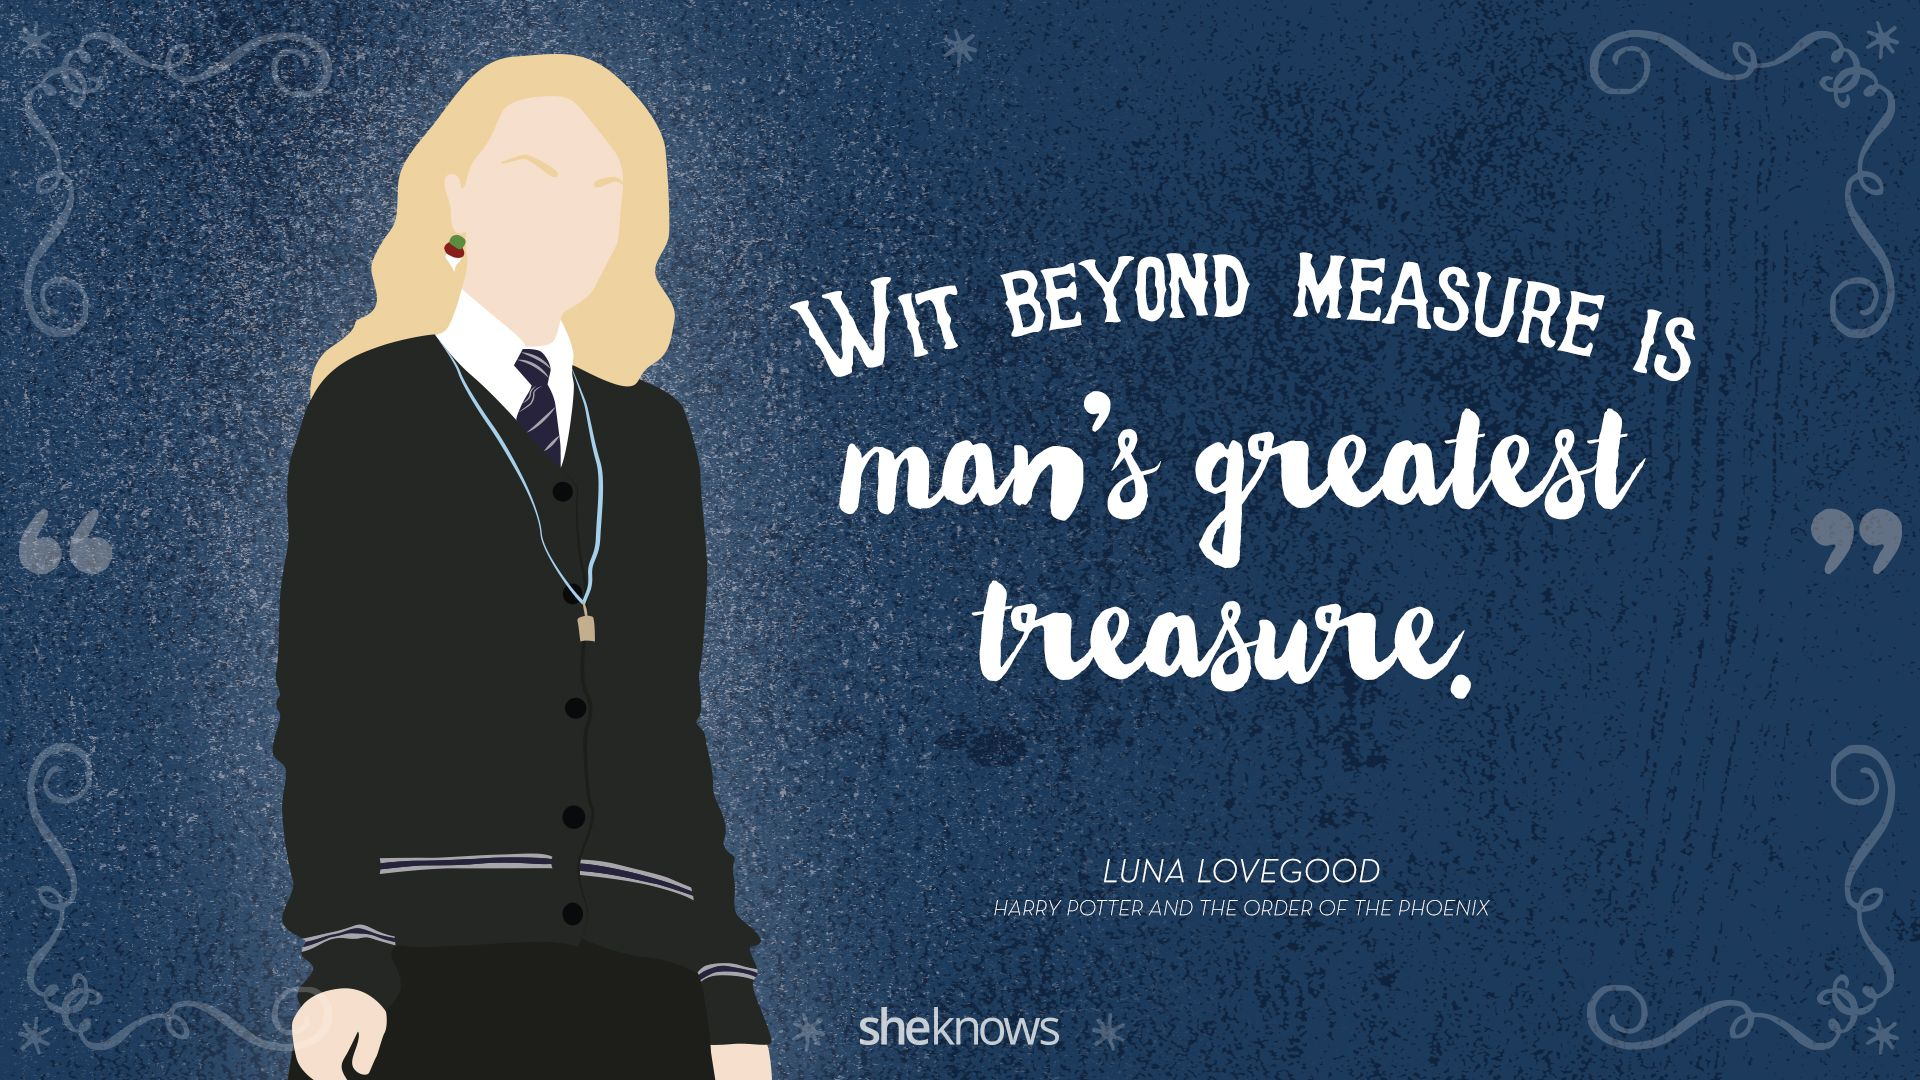 786x1017 Harry Potter Quotes Wallpaper Fandoms  E2 99 86 Pinterest